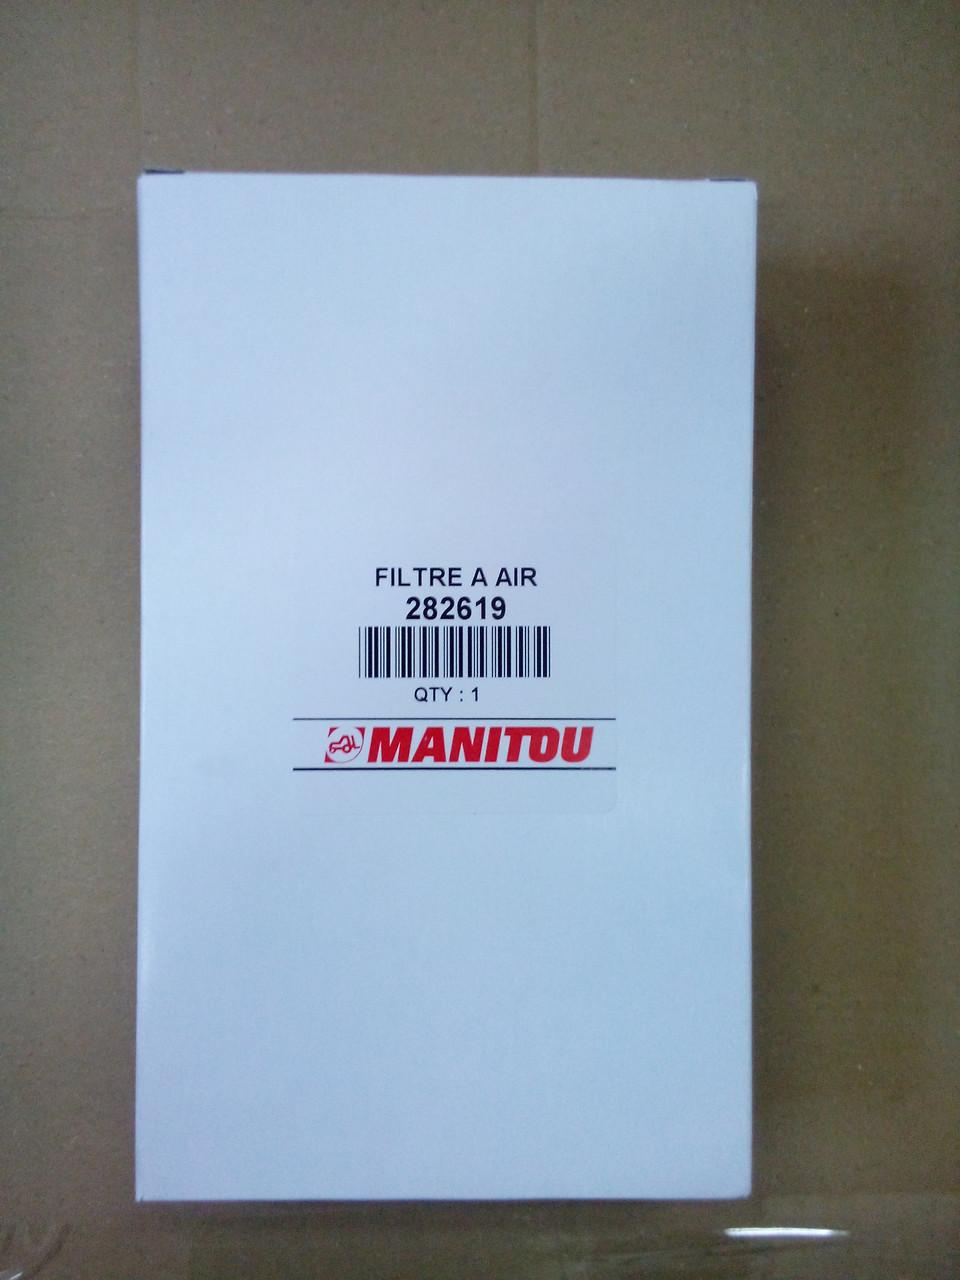 282619Фильтр воздушный кабины Manitou (Маніту, Маниту) оригінал